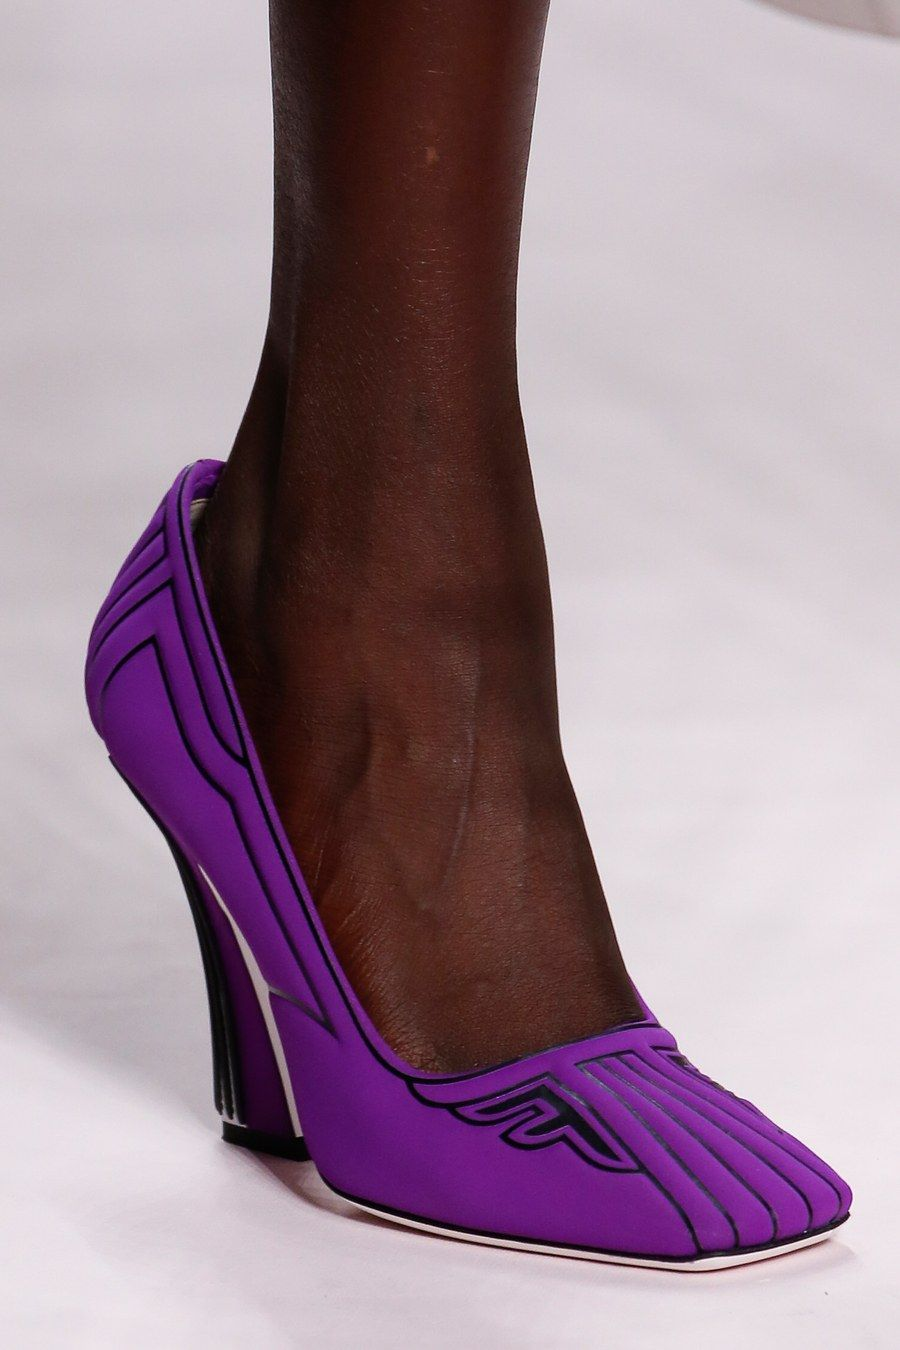 OnlyFootwearReview:Обзор обуви | Обувь